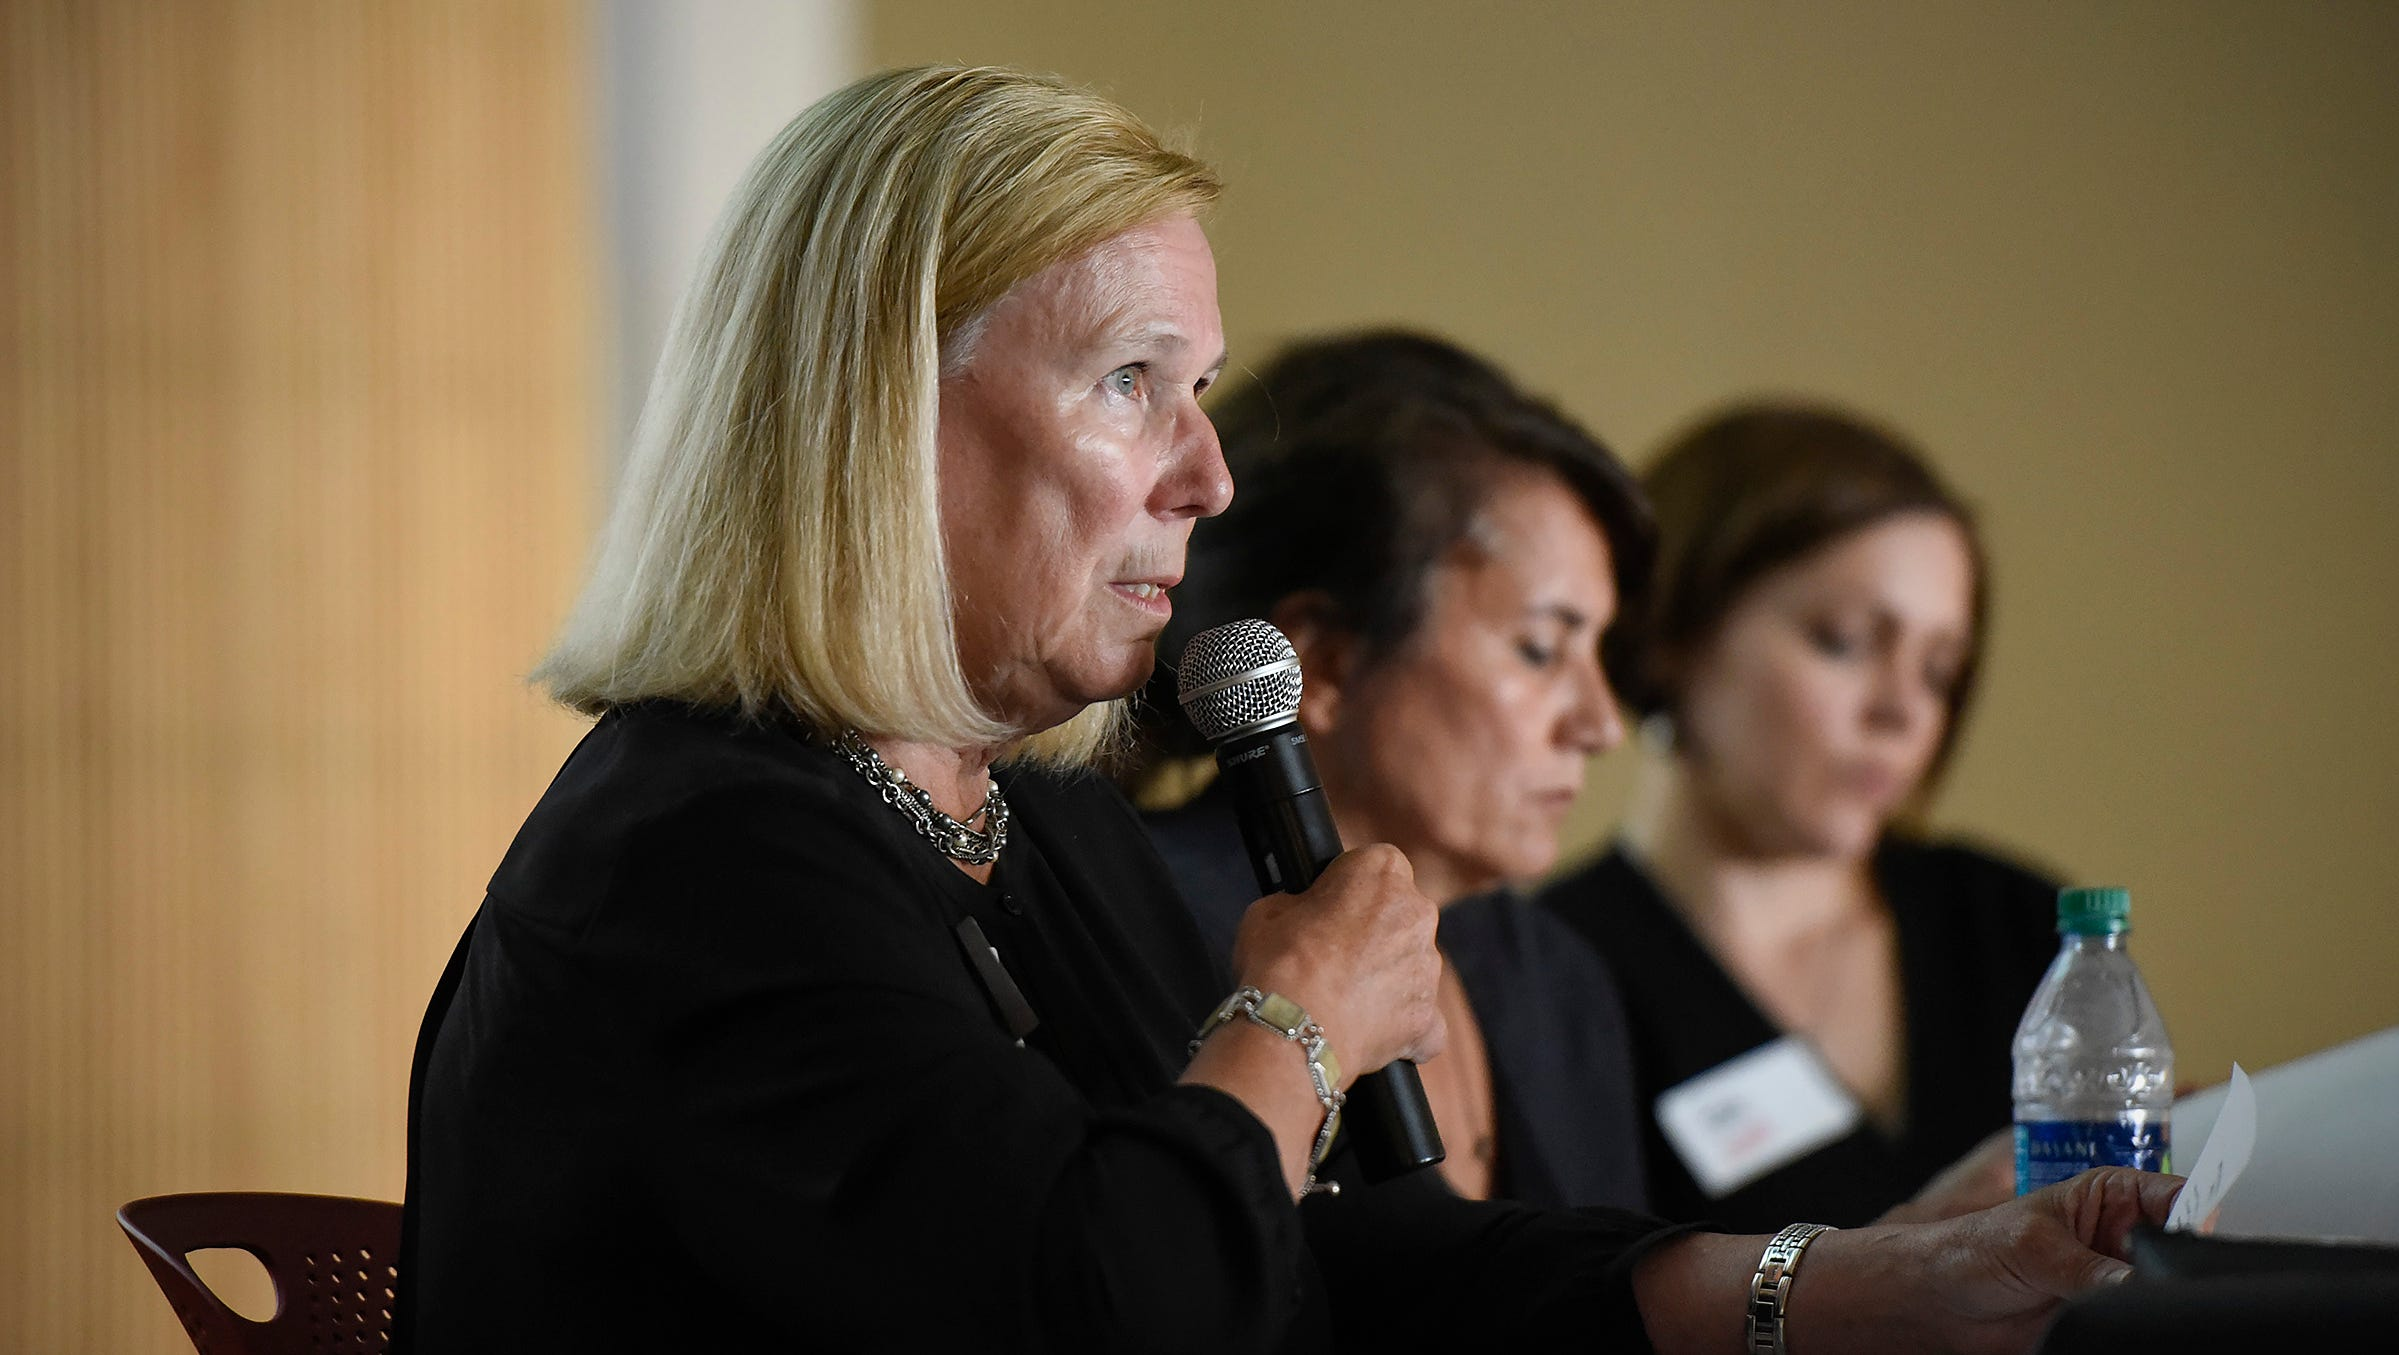 Kris Sundberg, president of Elder Voice Family Advocates, spoke during an AARP panel discussion on elder abuse legislation Wednesday, Sept. 12, at the Great River Regional Library in St. Cloud.